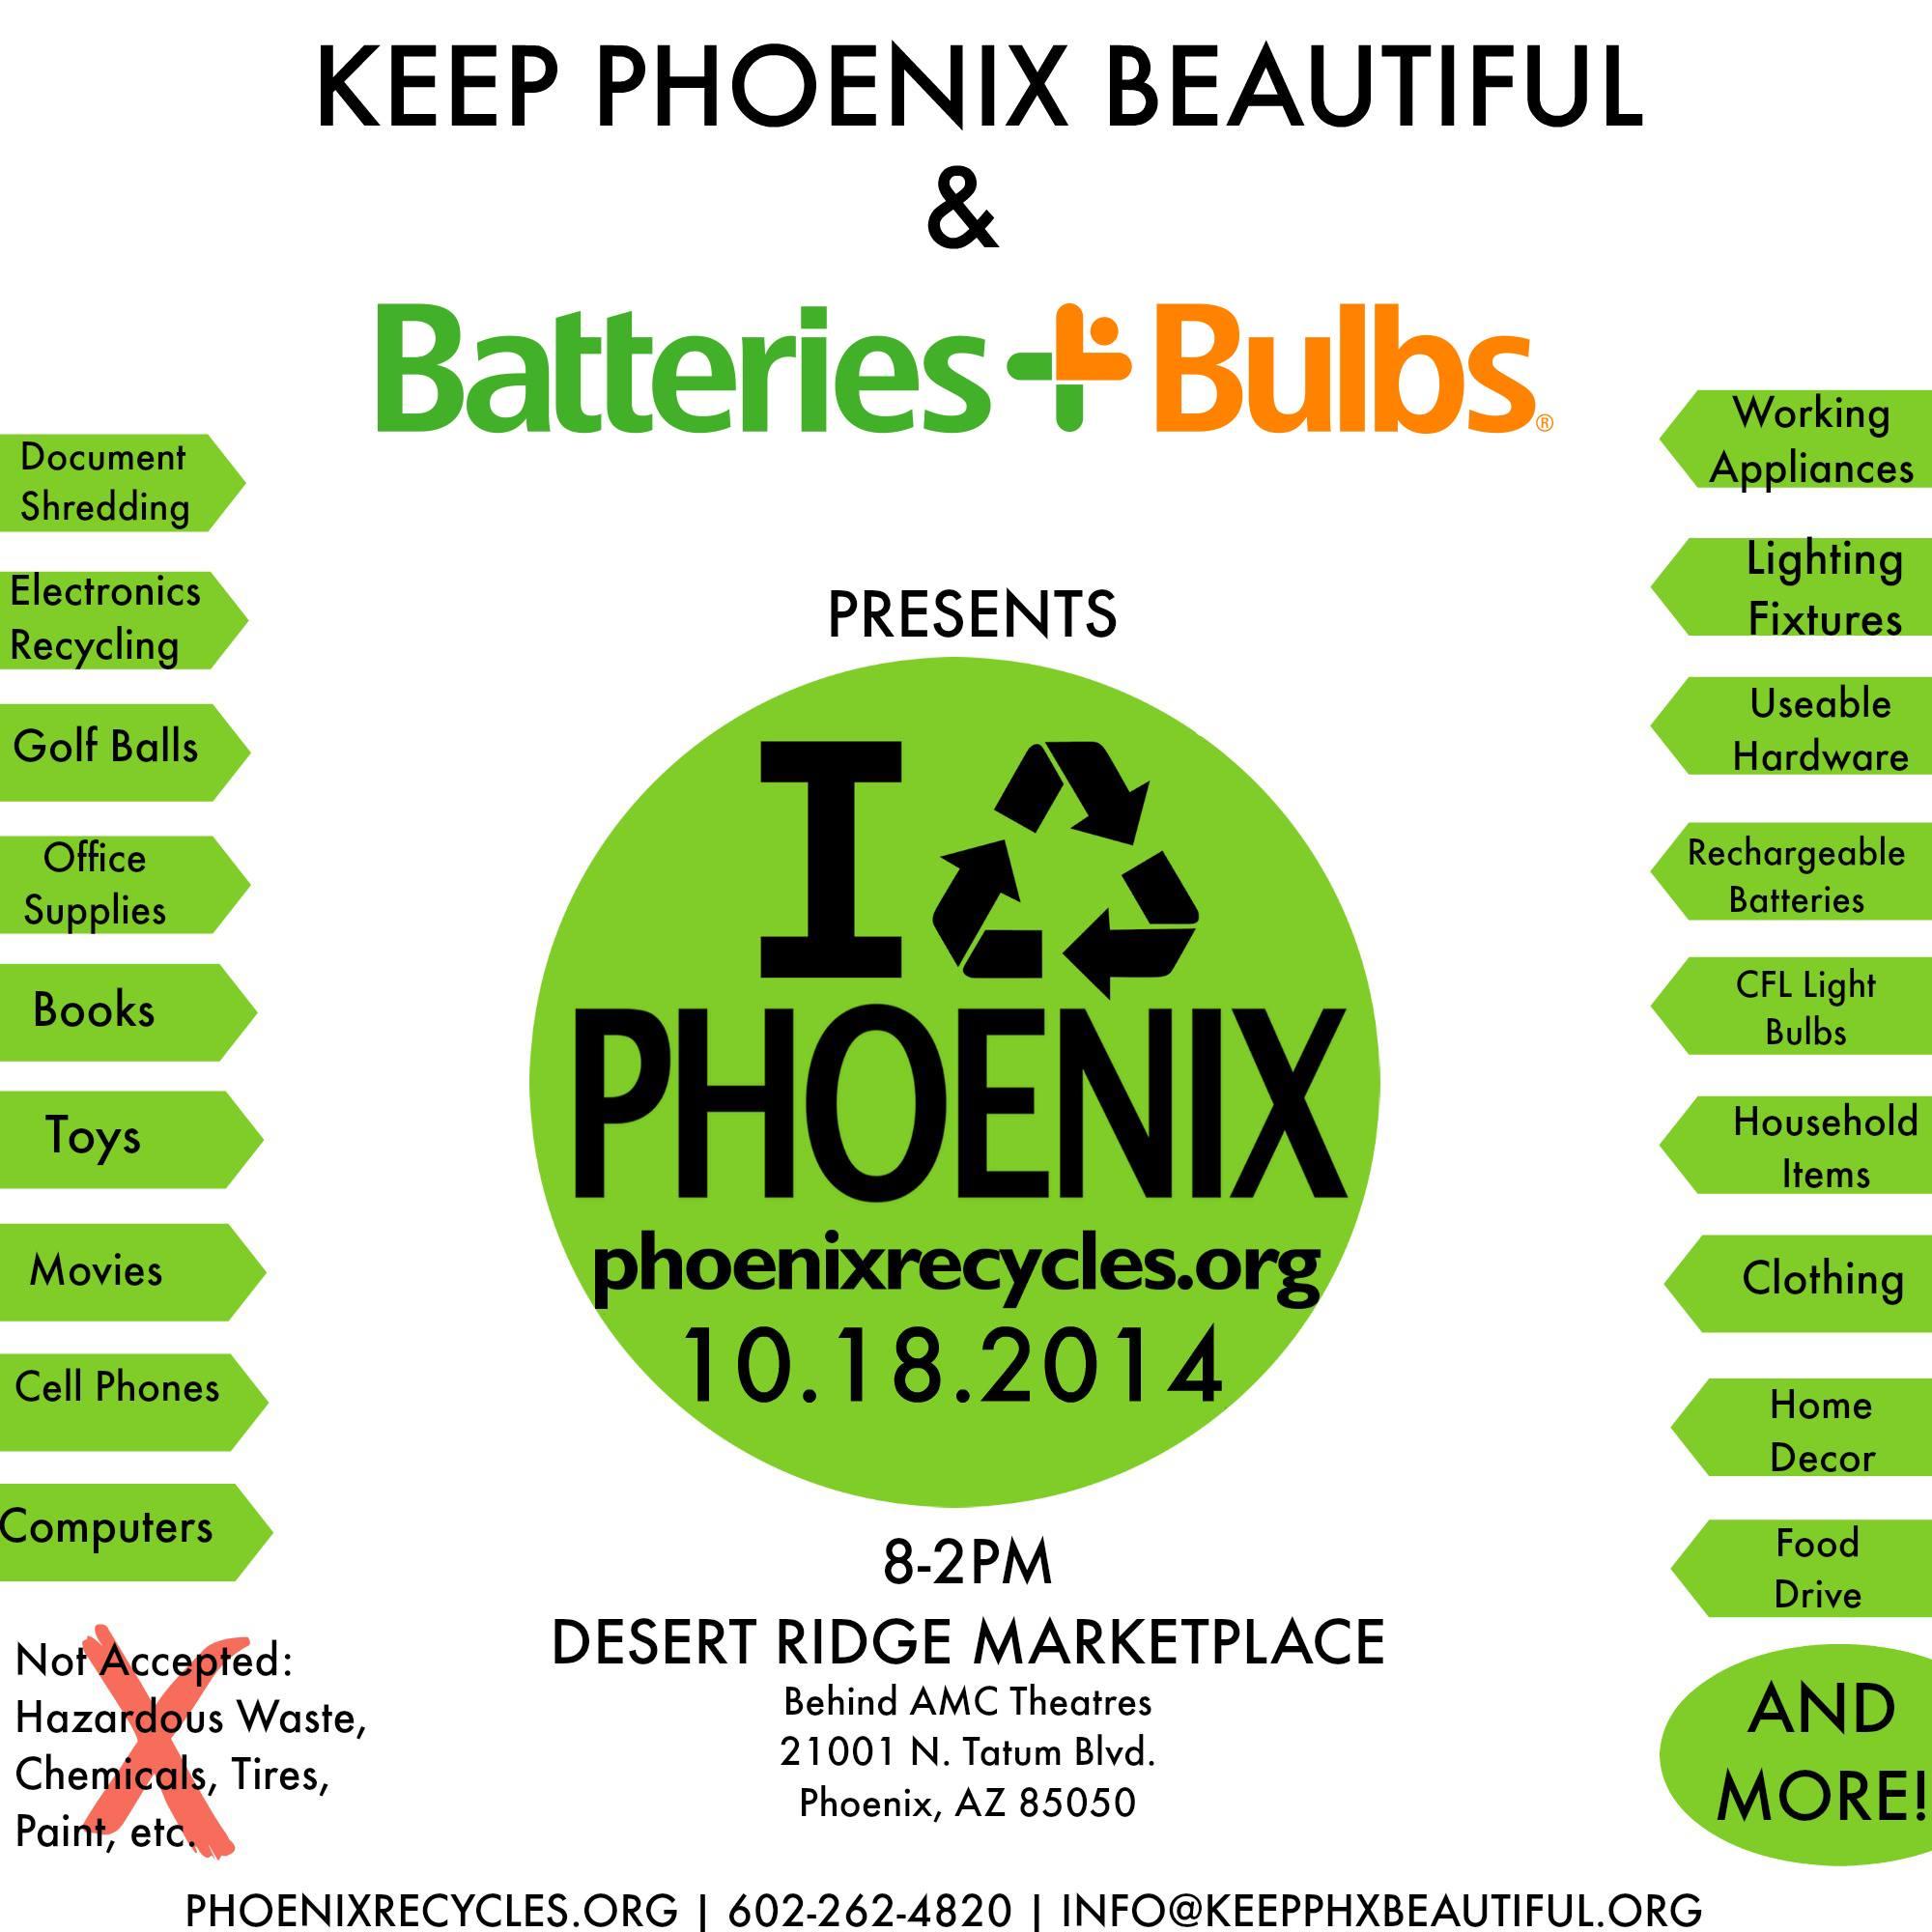 Batteries Plus Bulbs 6680 W Bell Rd Suite A, Glendale